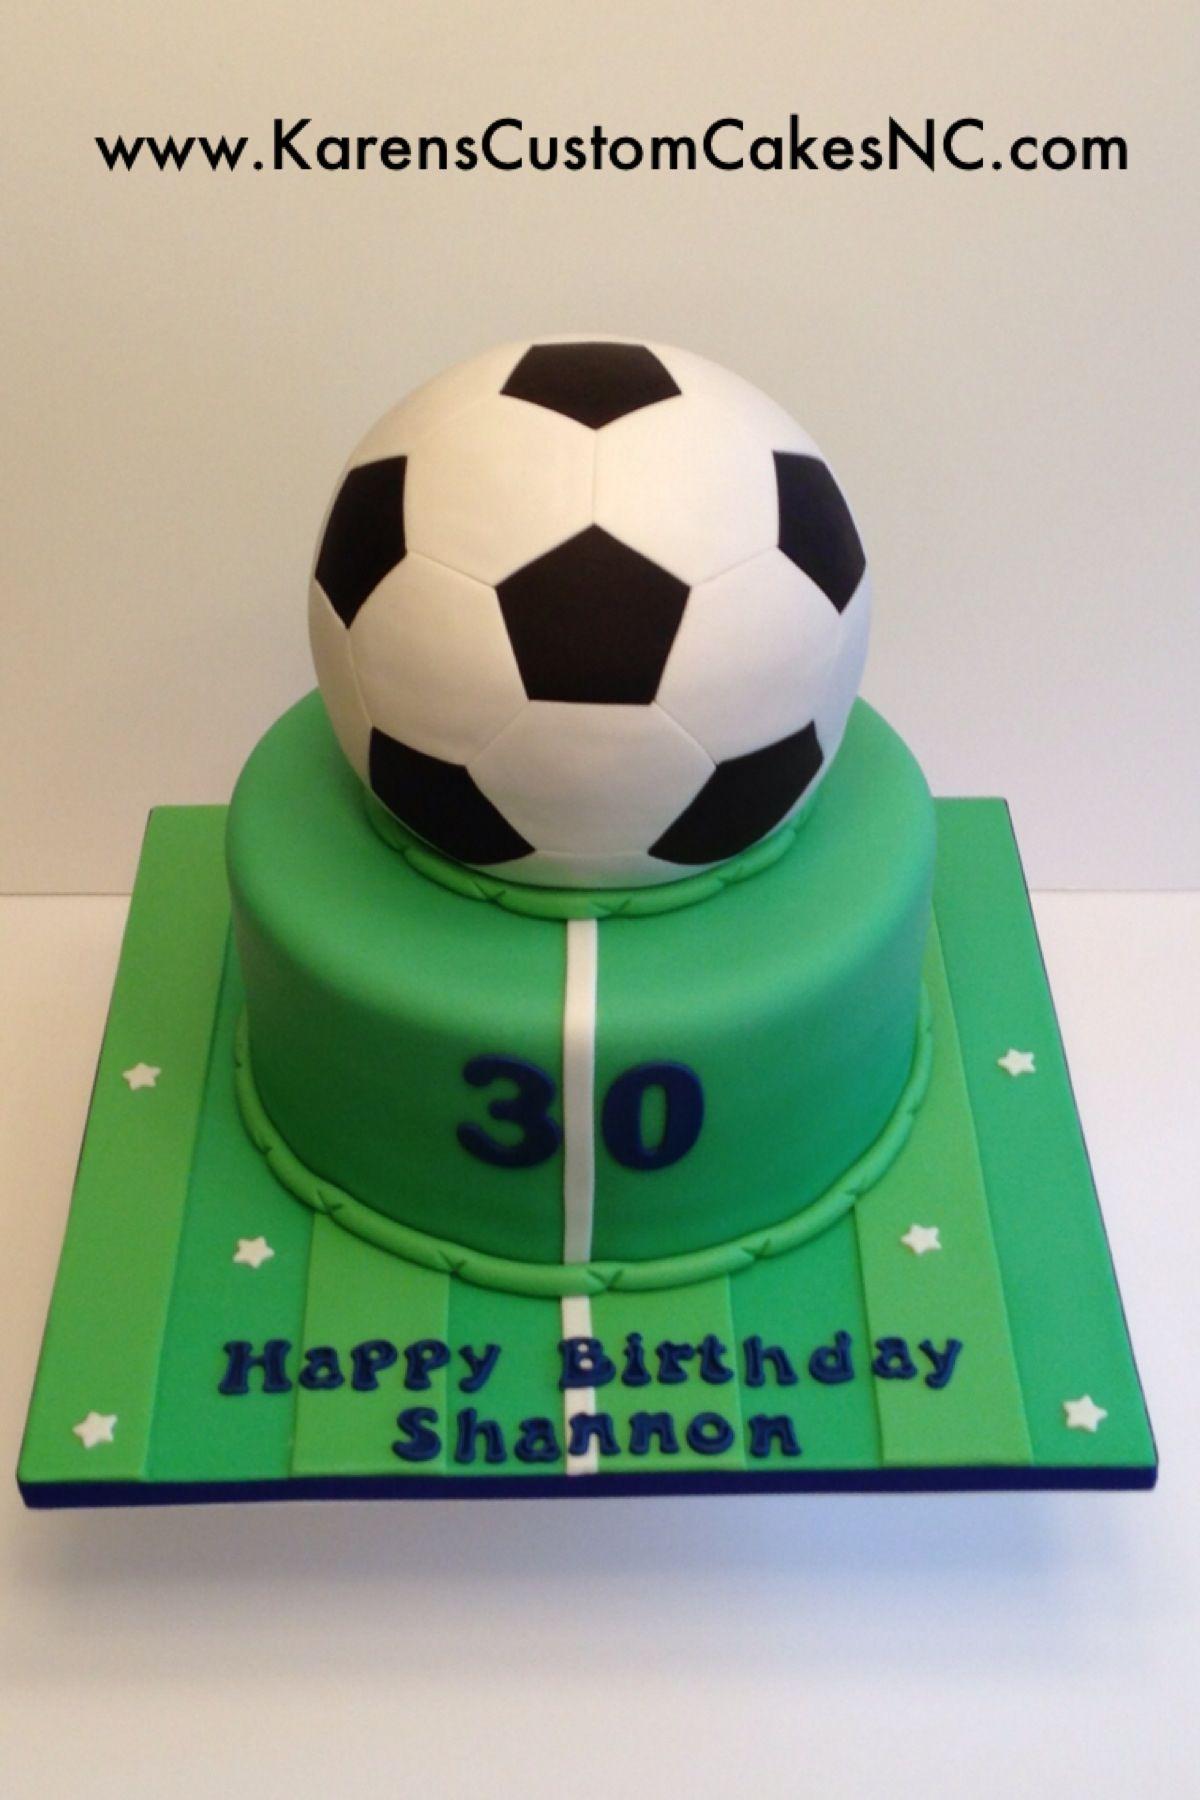 3D Soccer Ball cake All fondant Original design by The Royal